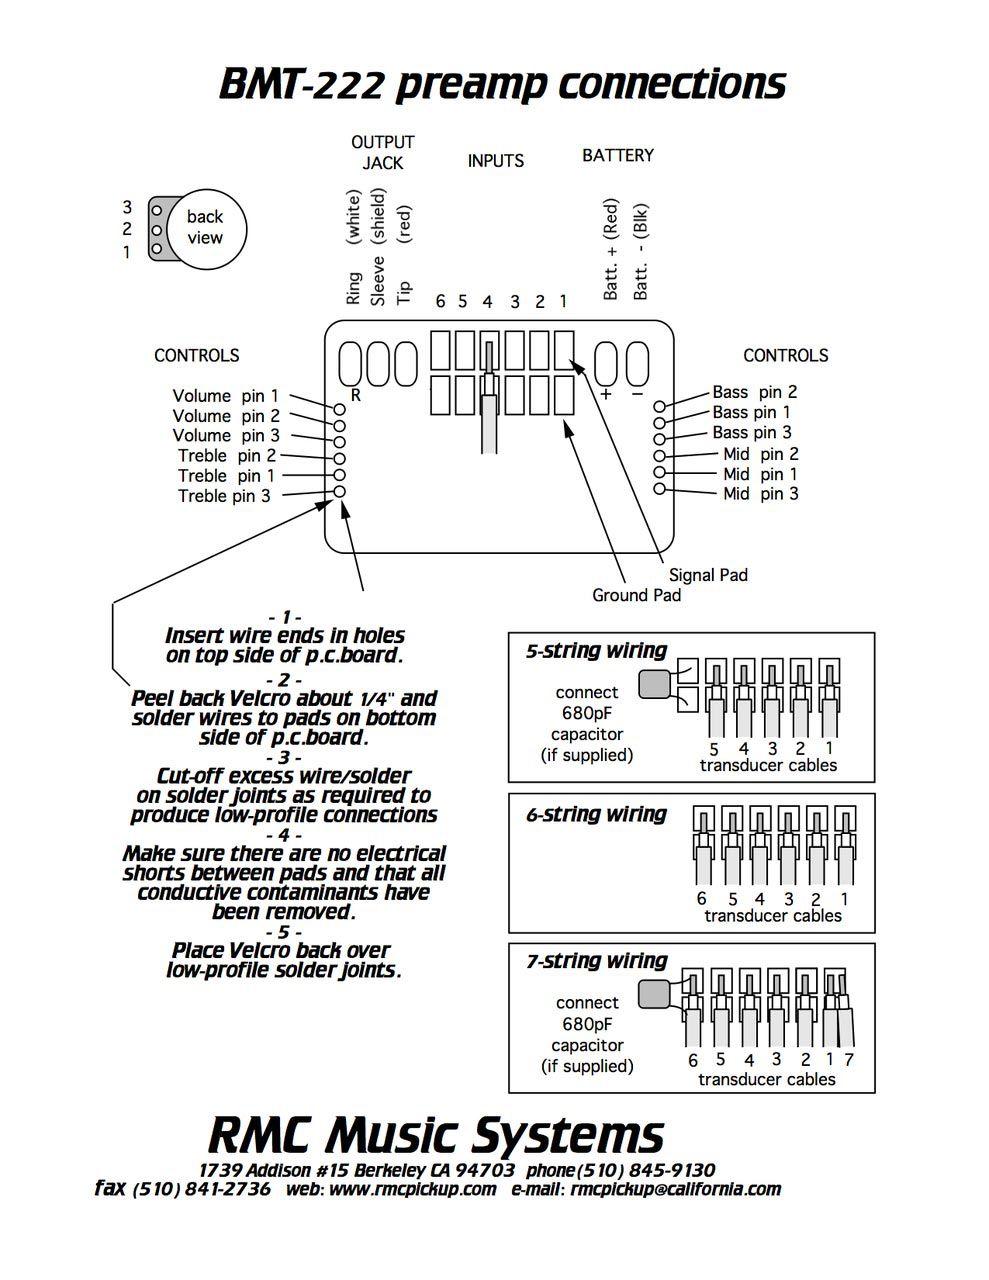 Preamp RMC interno mono BMT-222G p/ Violão, Cavaco,Bandolim, Viola Caipira  - SOLO MUSICAL